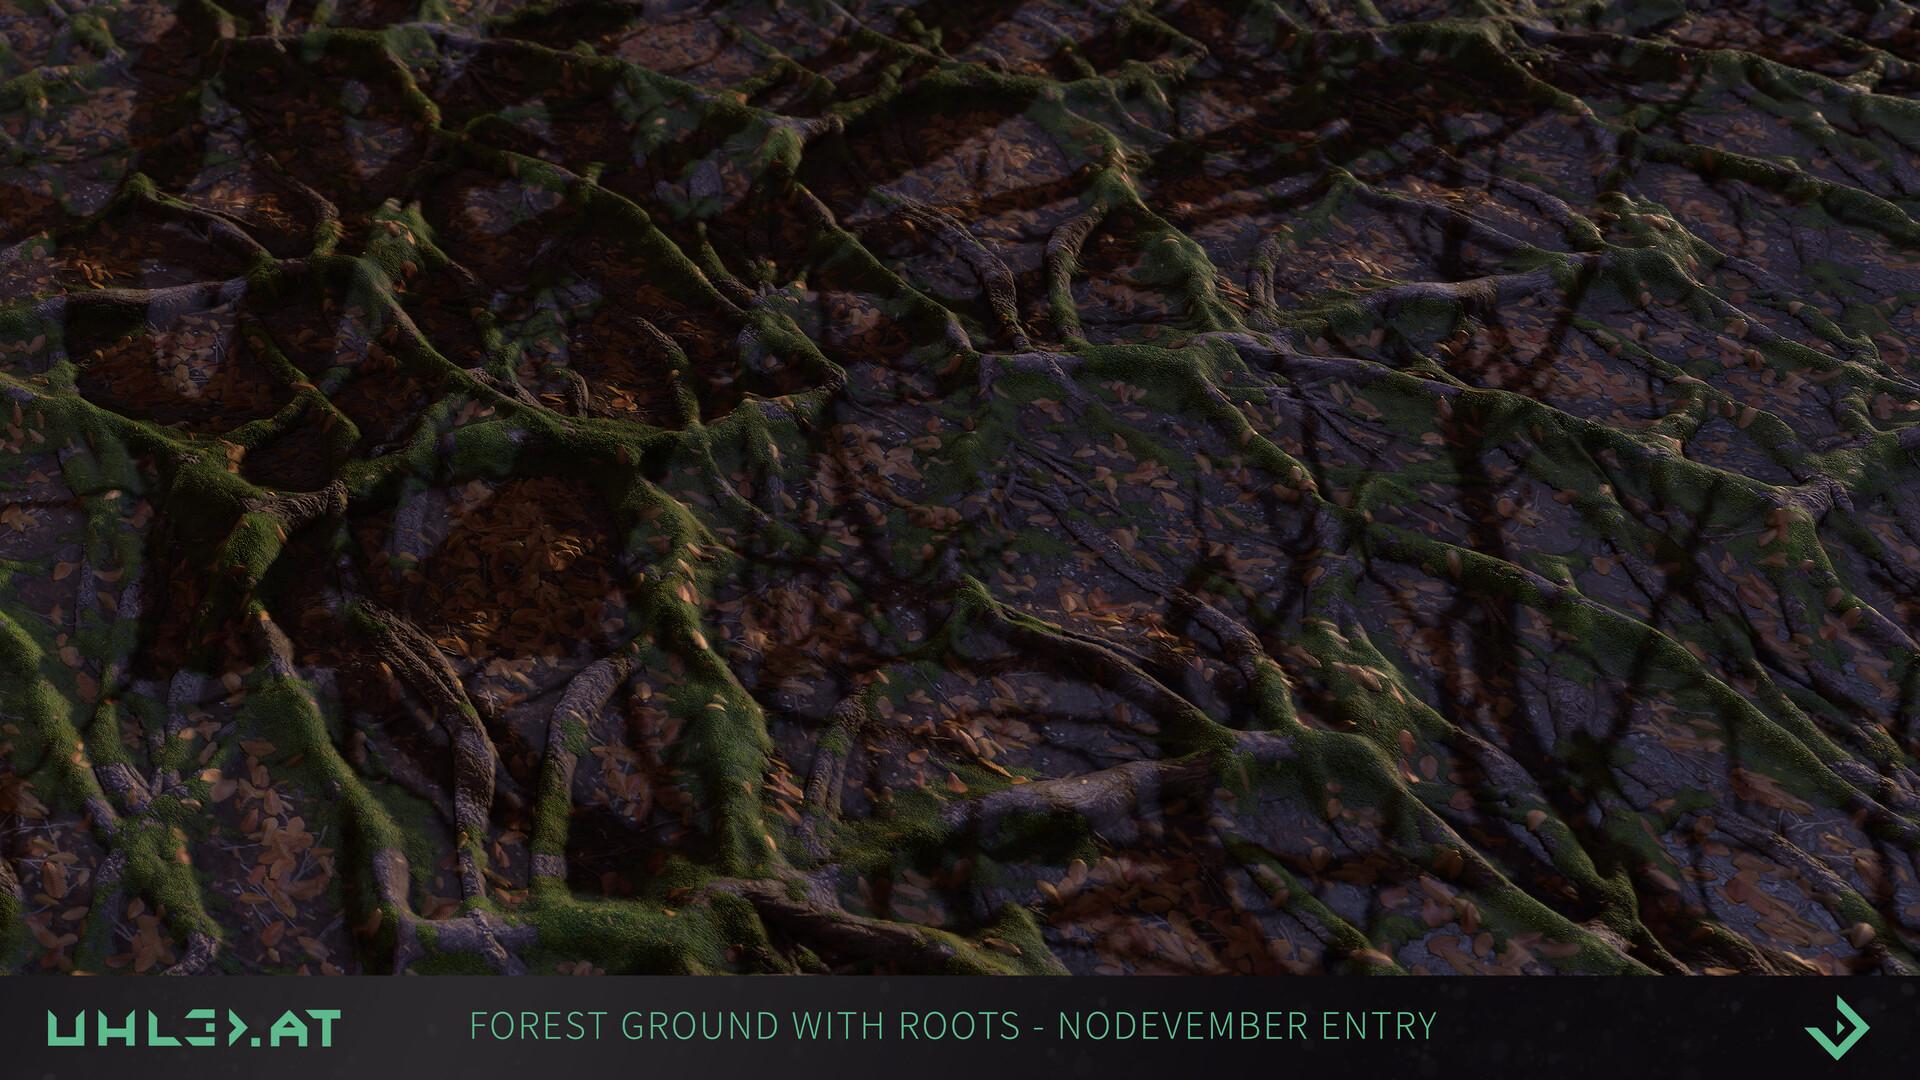 Dominik uhl organic woodgrounds with roots 04